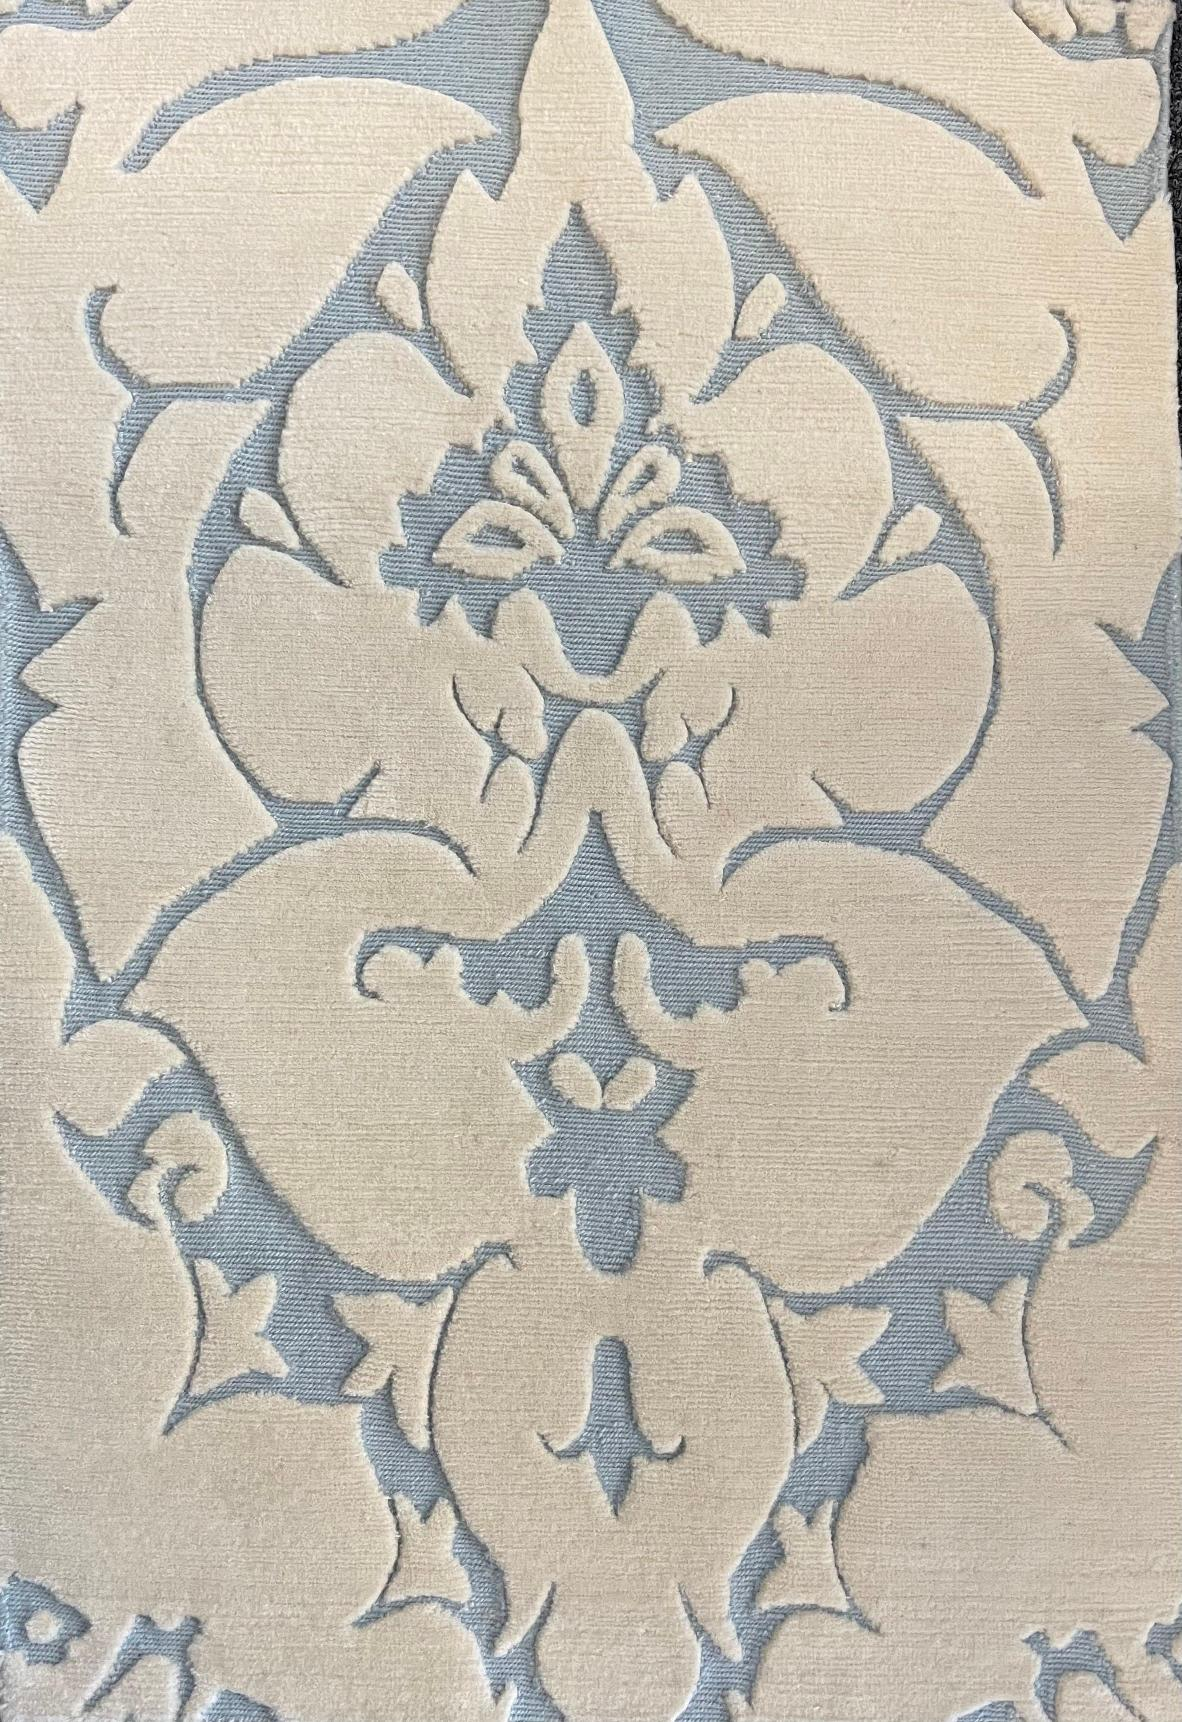 447 Cipriani; Crema, Light Blue